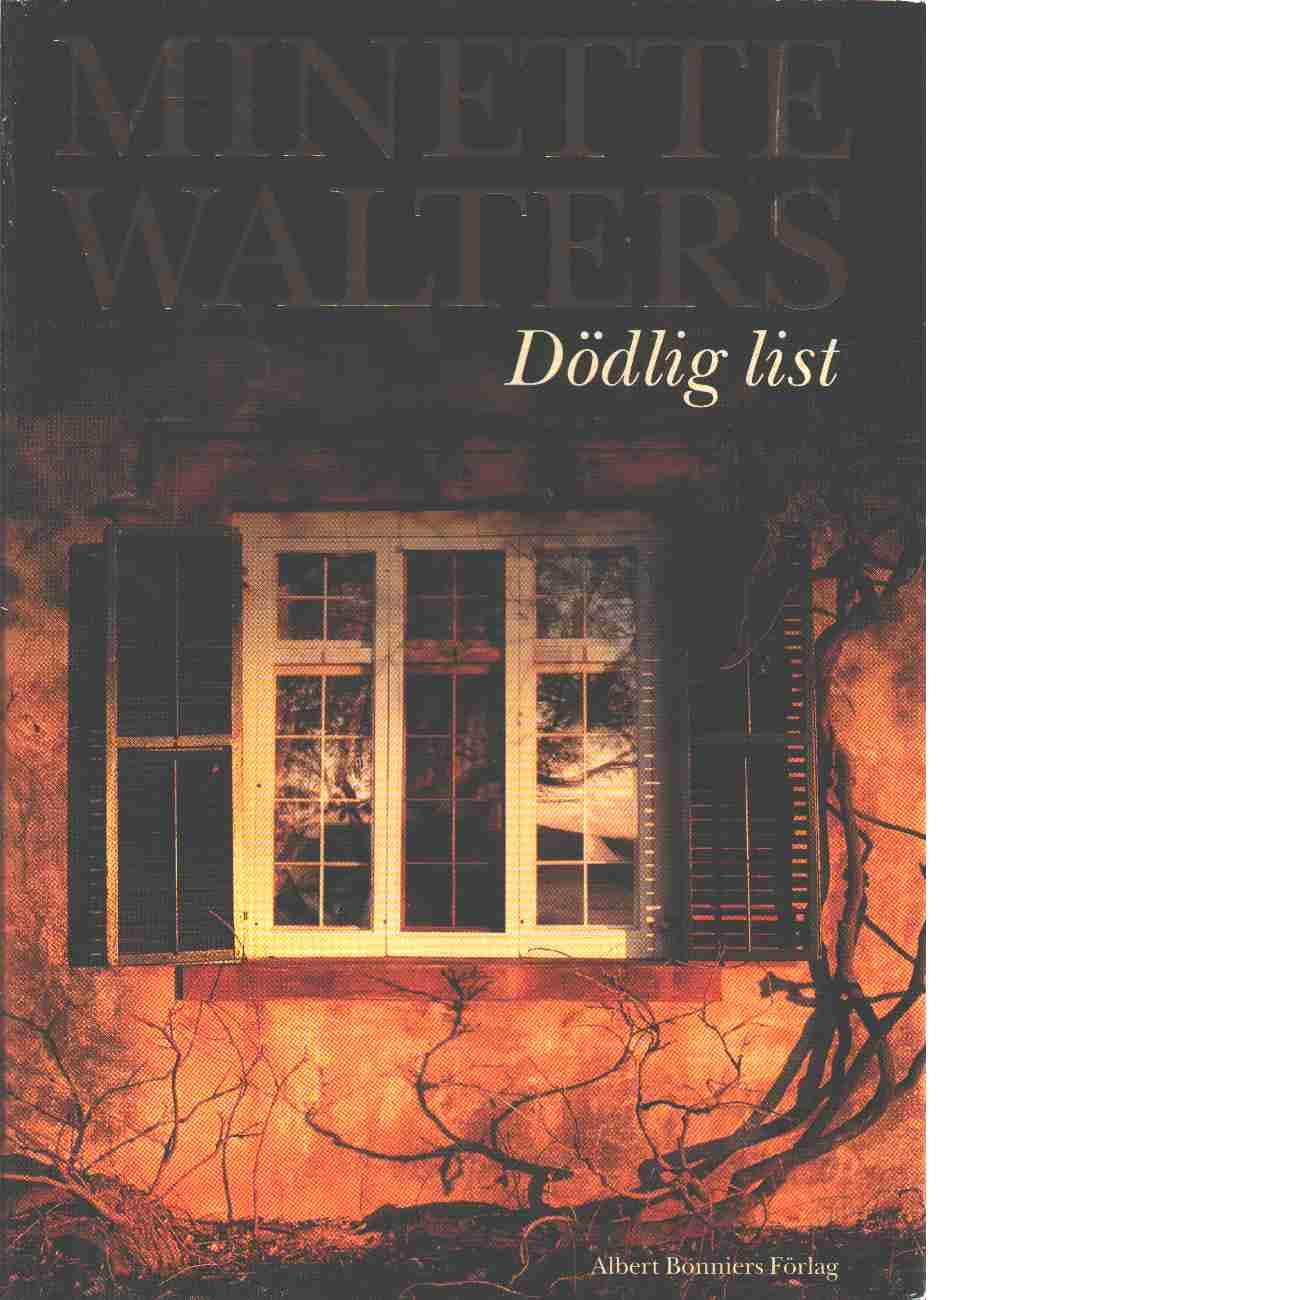 Dödlig list - Walters, Minette